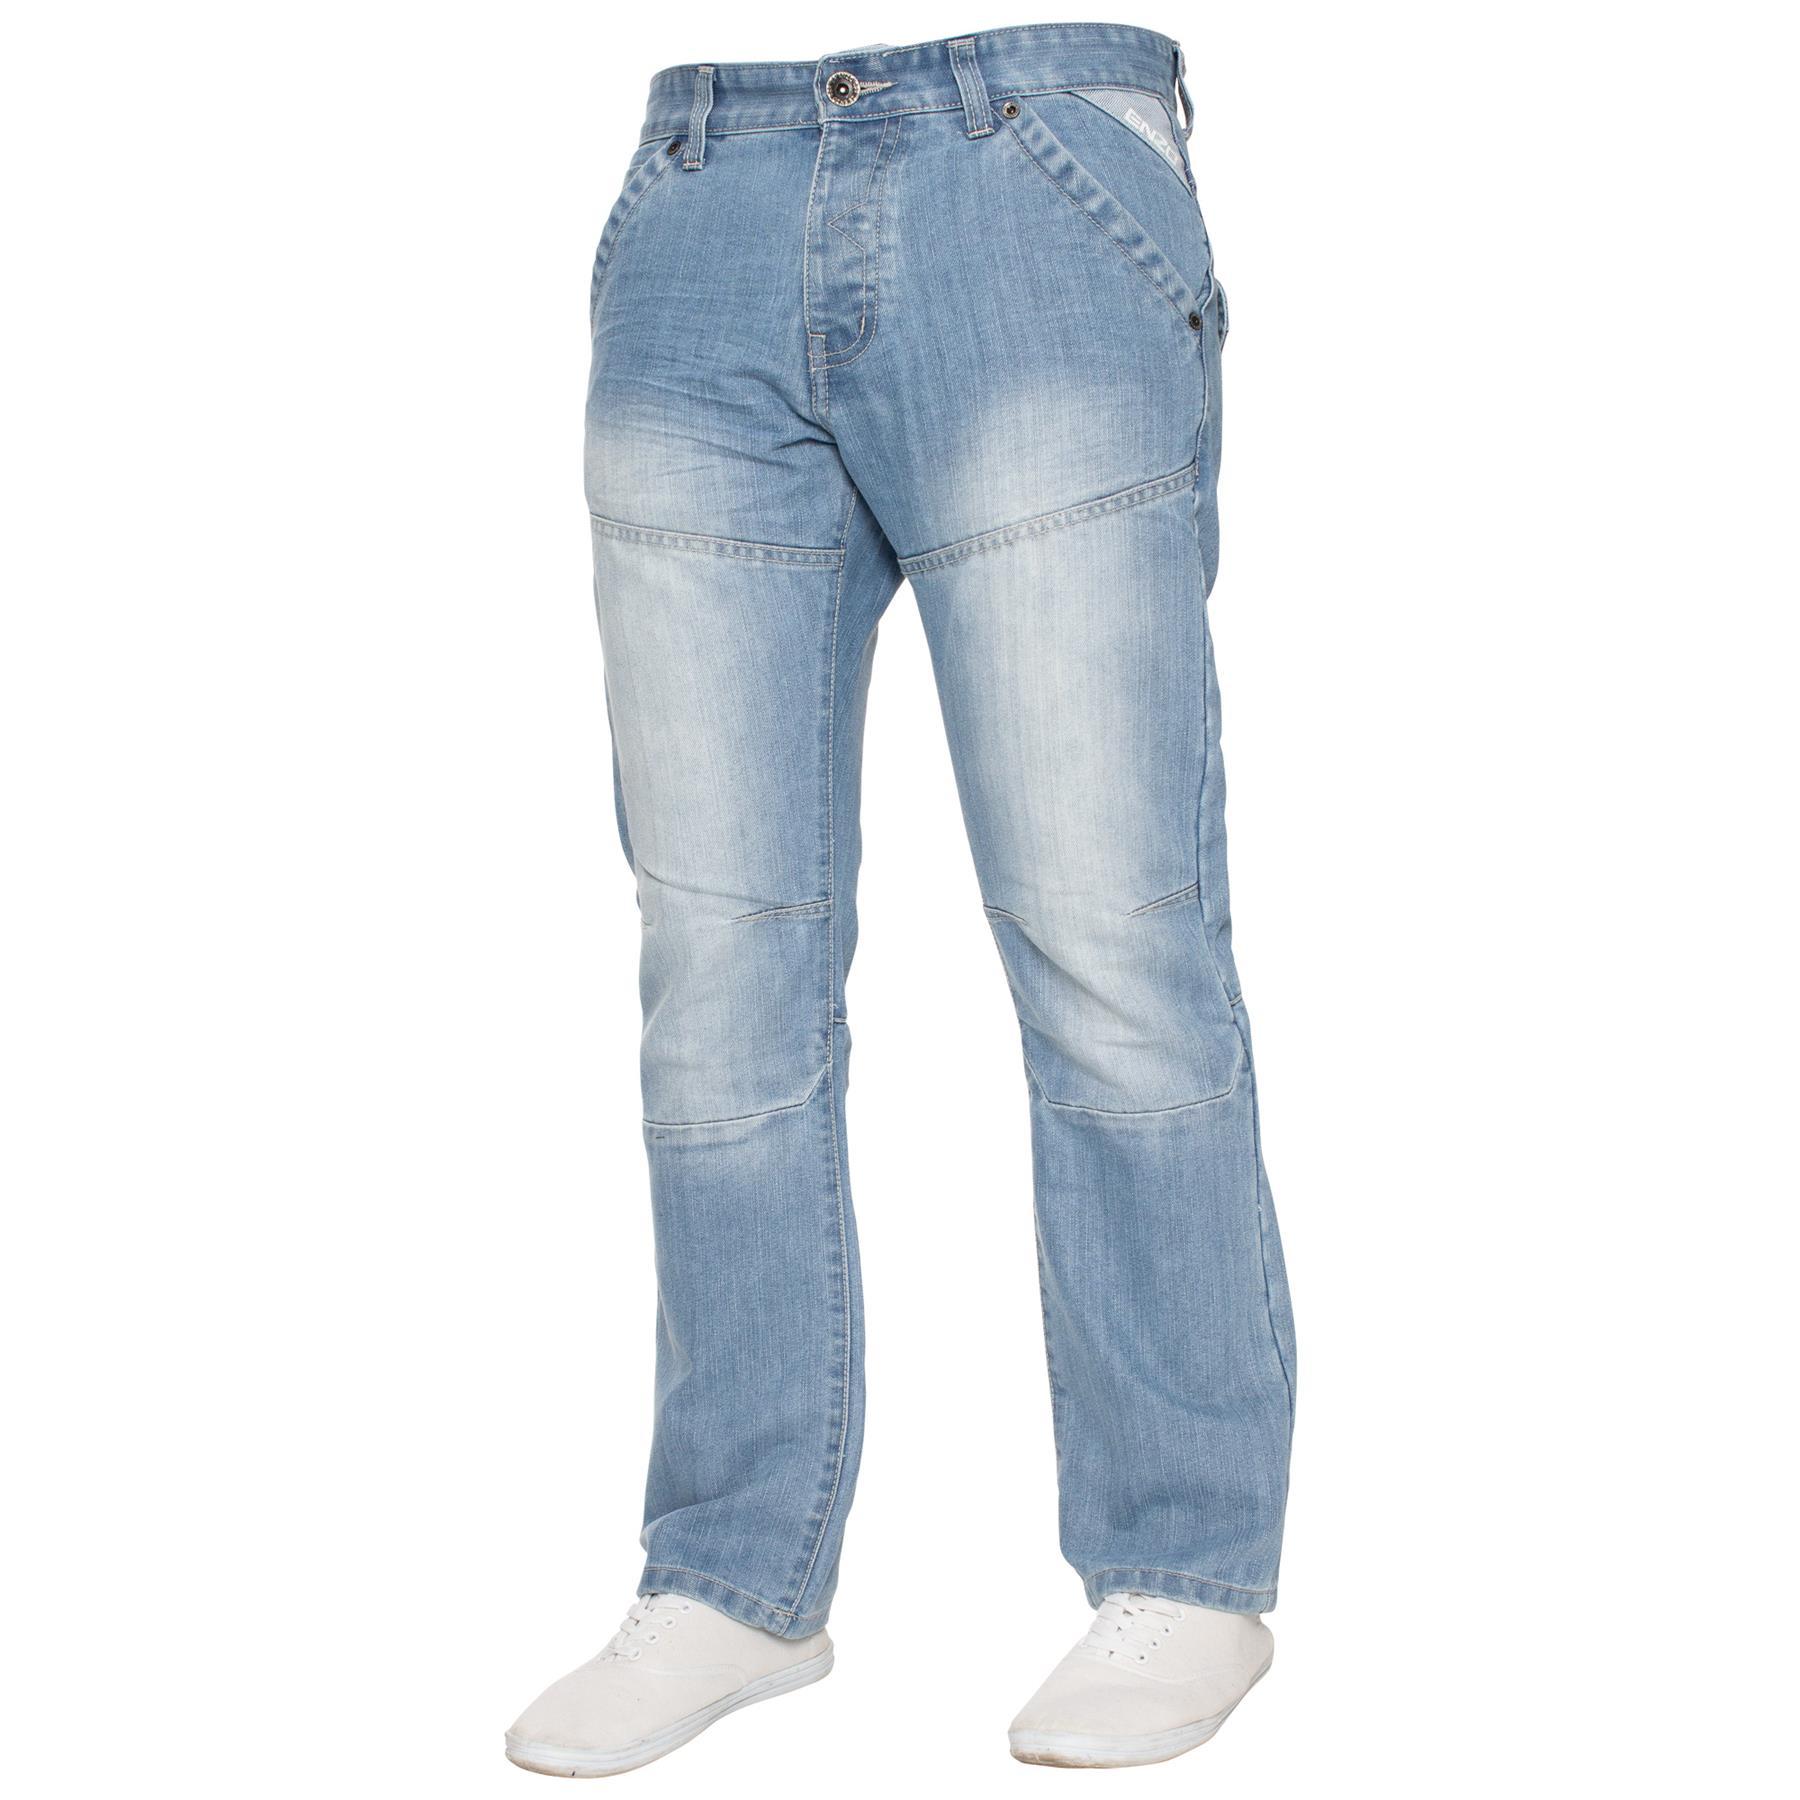 ENZO-Jeans-para-hombre-Big-Alto-Pierna-King-Size-Jeans-Pantalones-Chino-Pantalones-Pantalones-44-034 miniatura 66